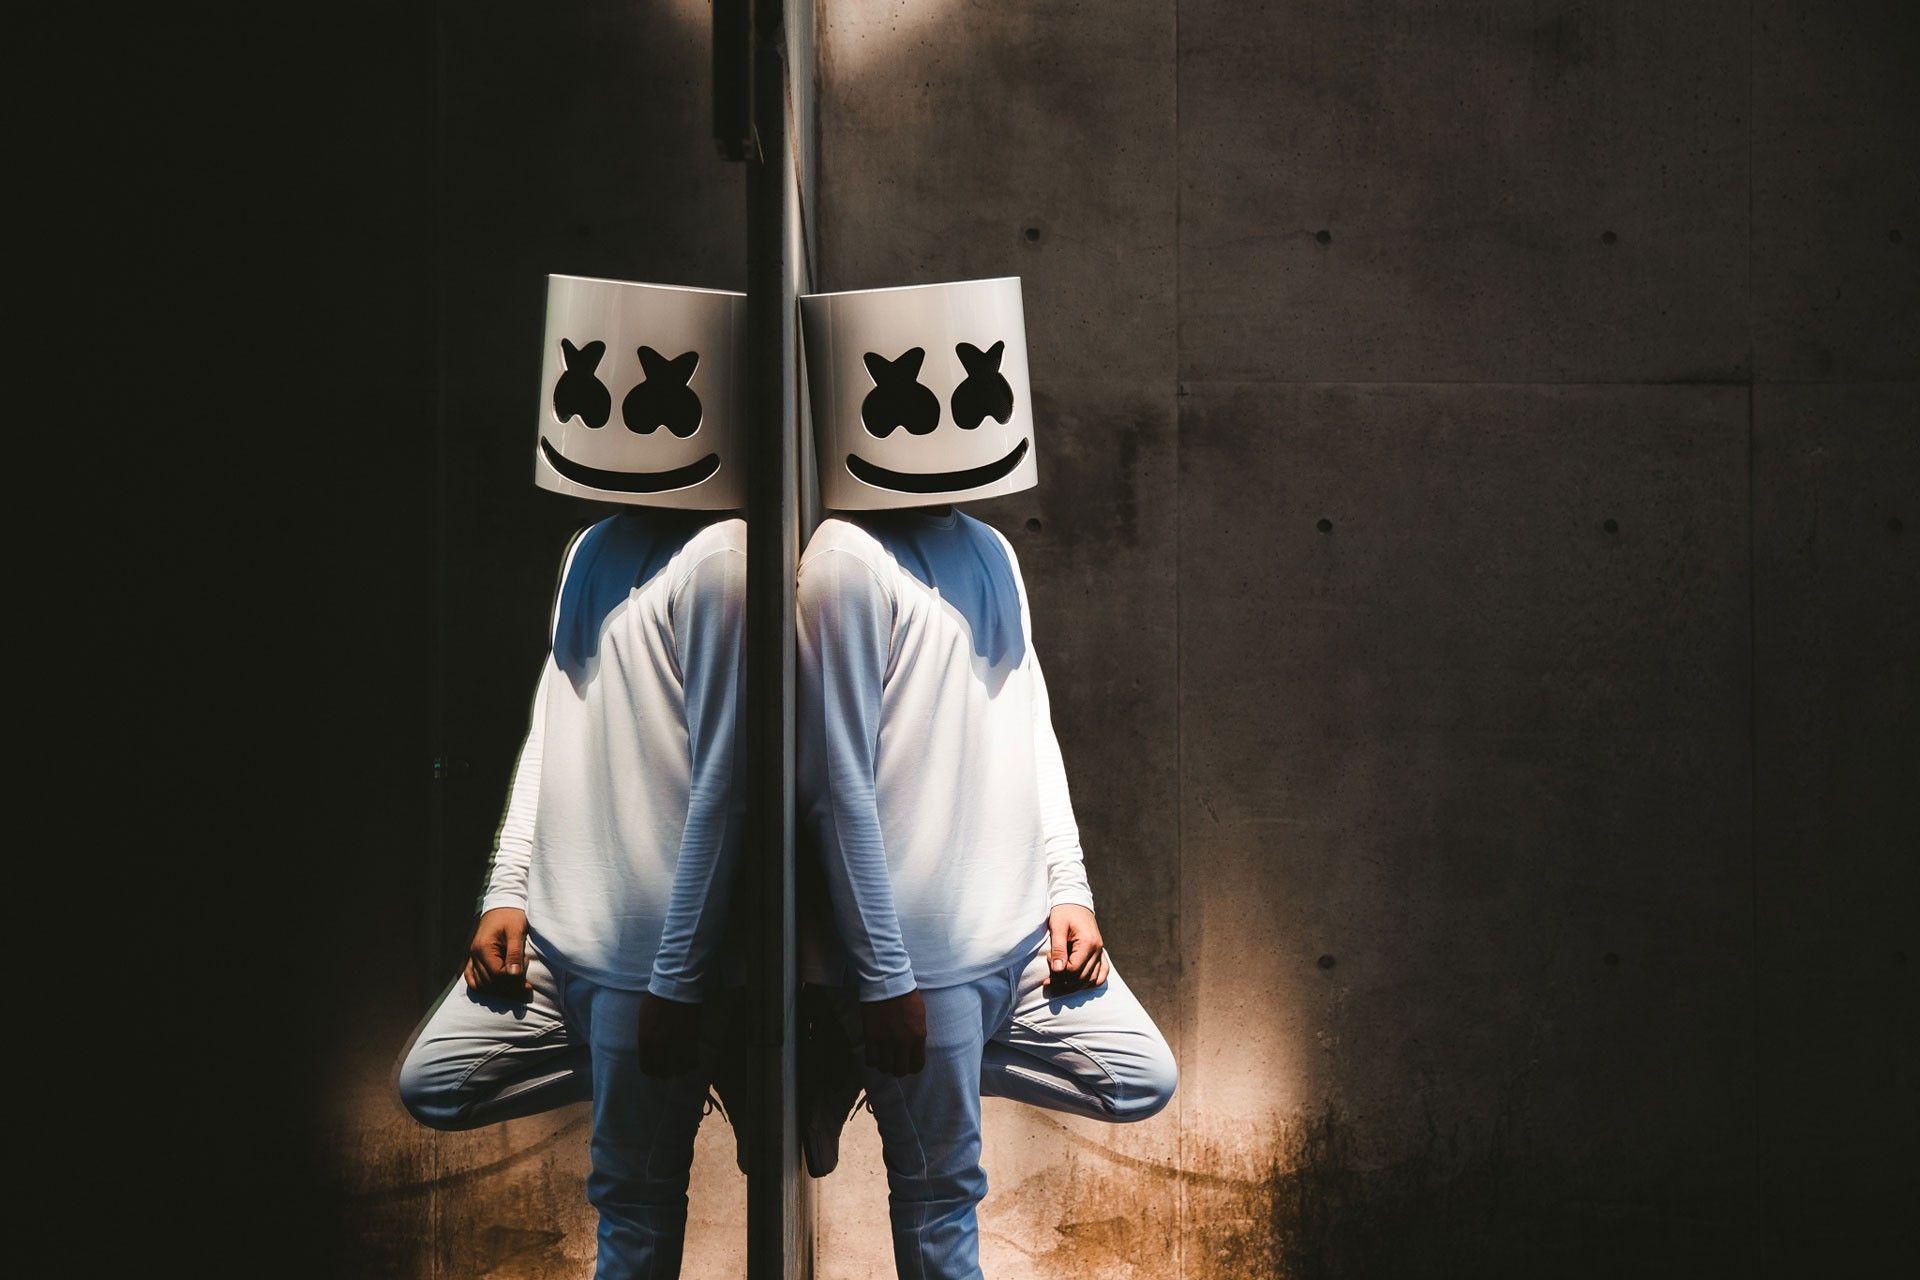 81 Marshmello Wallpapers Hd On Wallpapersafari